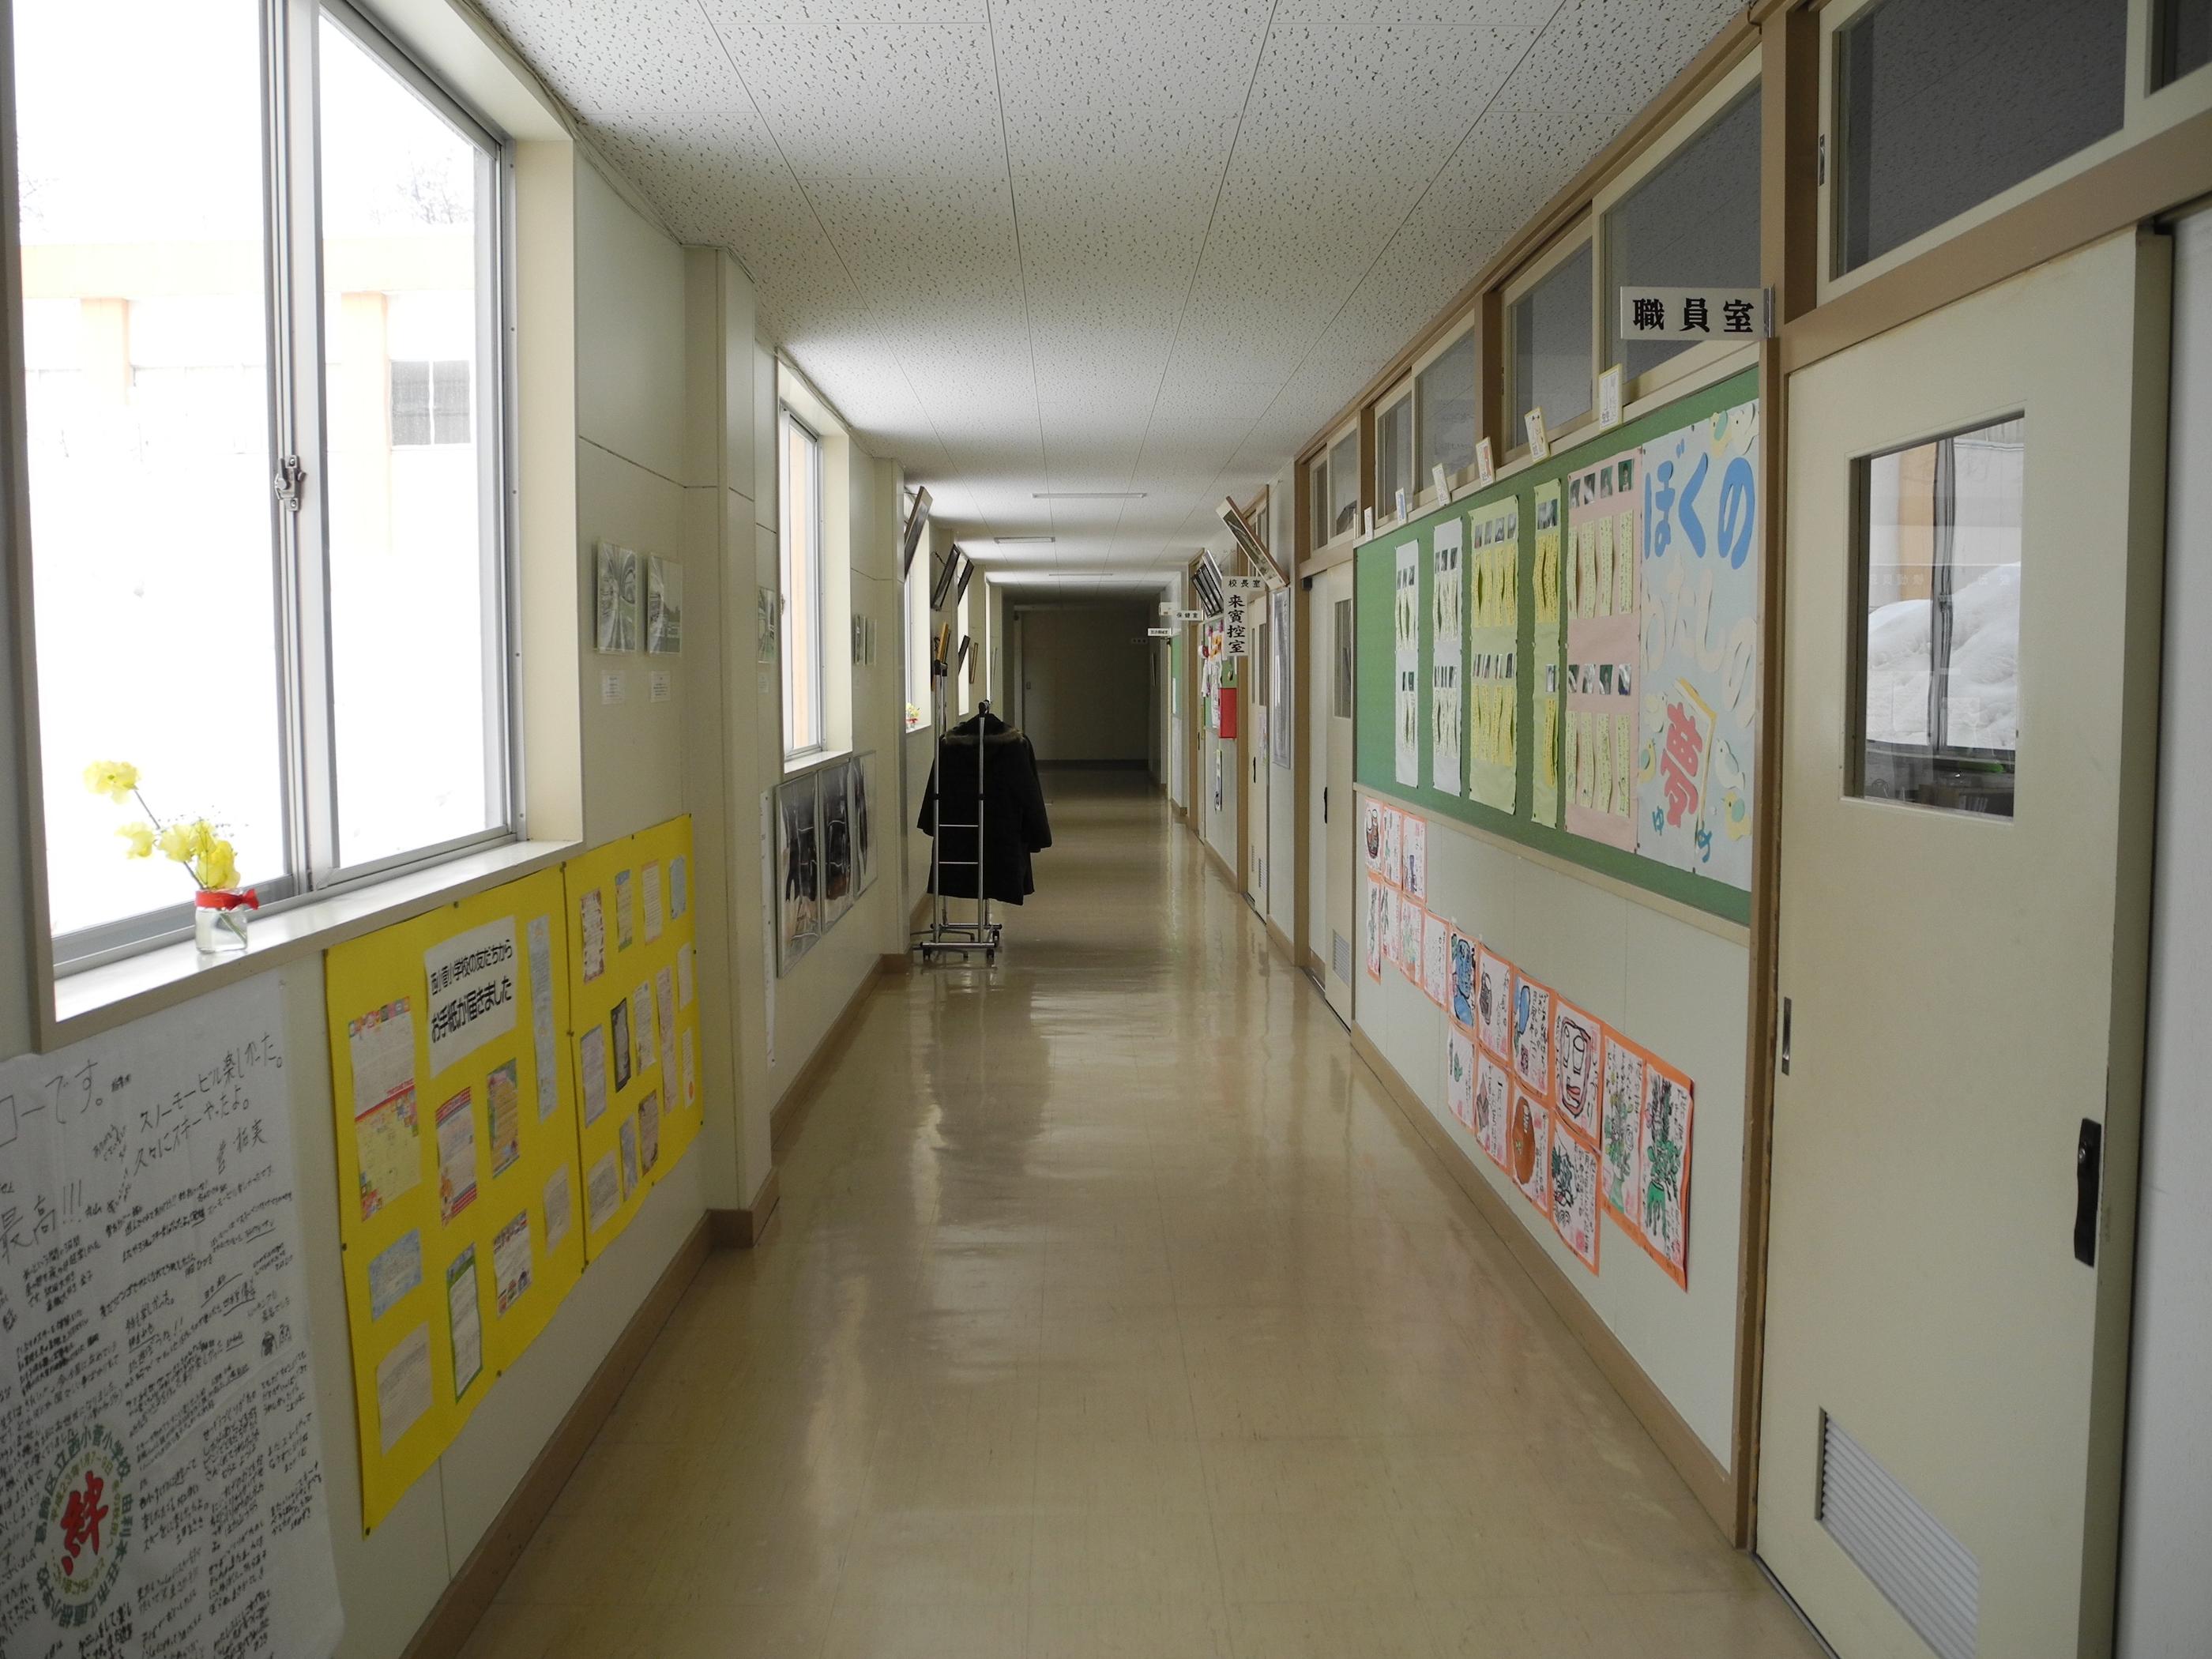 File:Hitane Elementary School 1F hallway B.jpg - Wikimedia ...